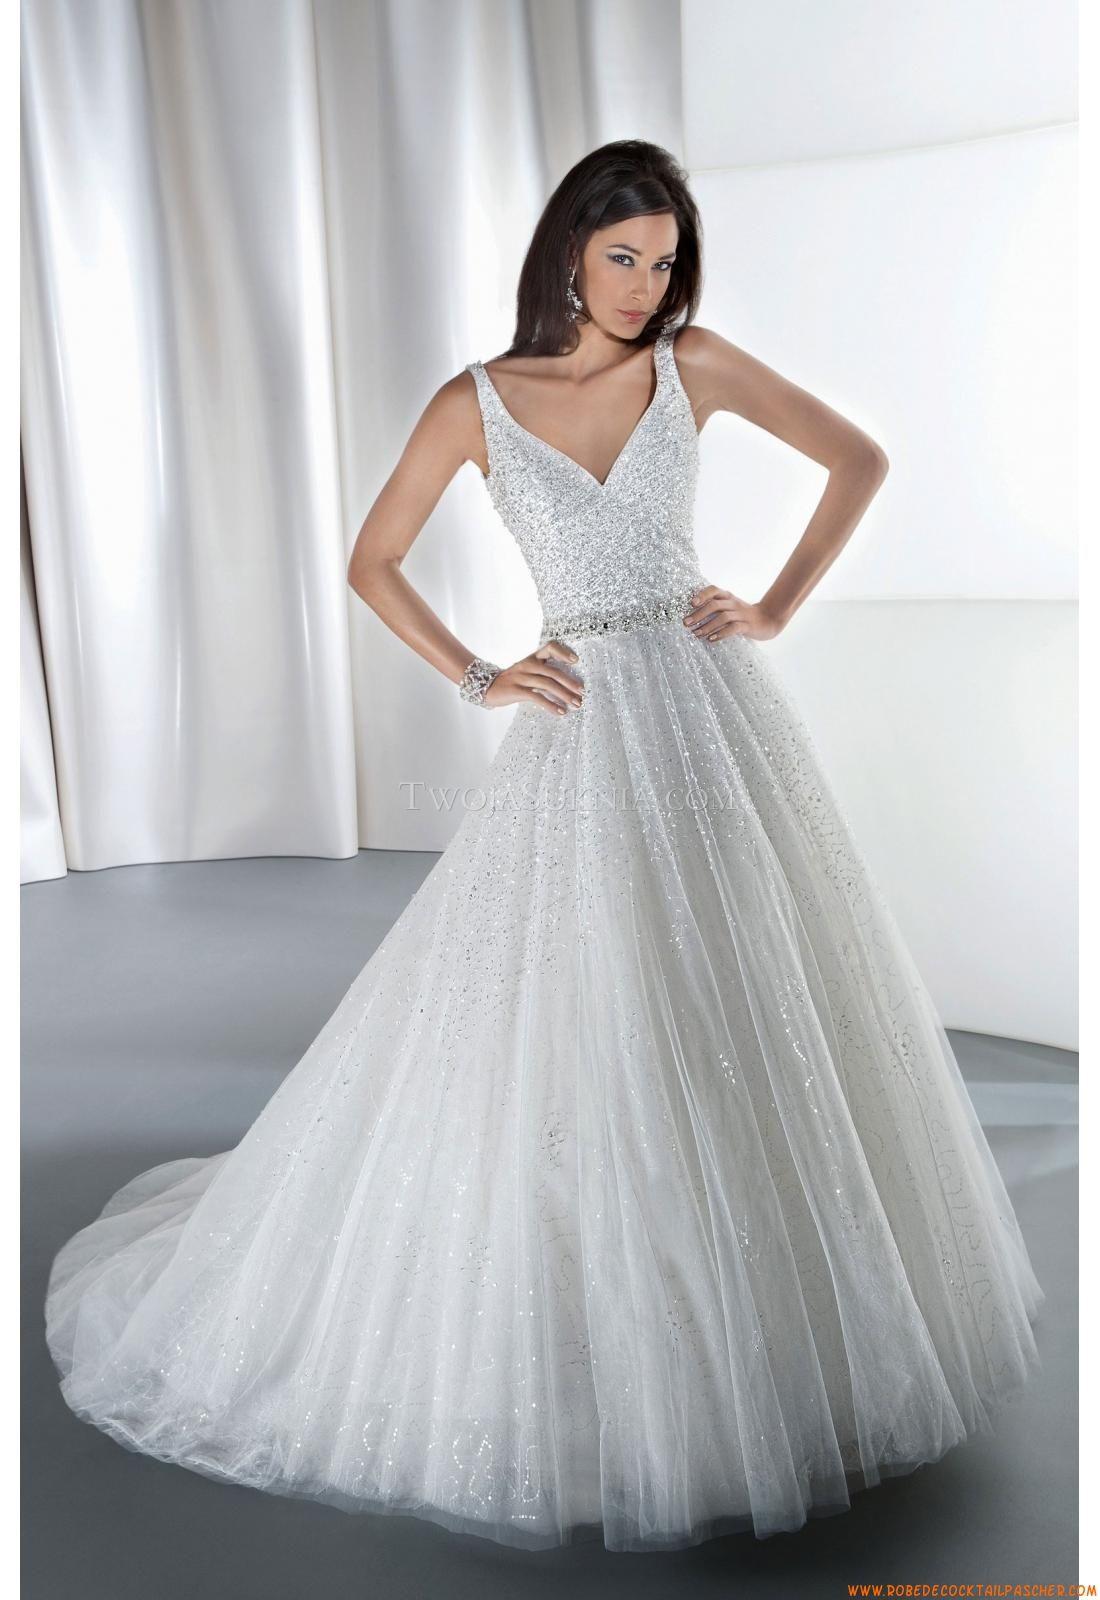 Robe de mariée demetrios robe de mariée demetrios